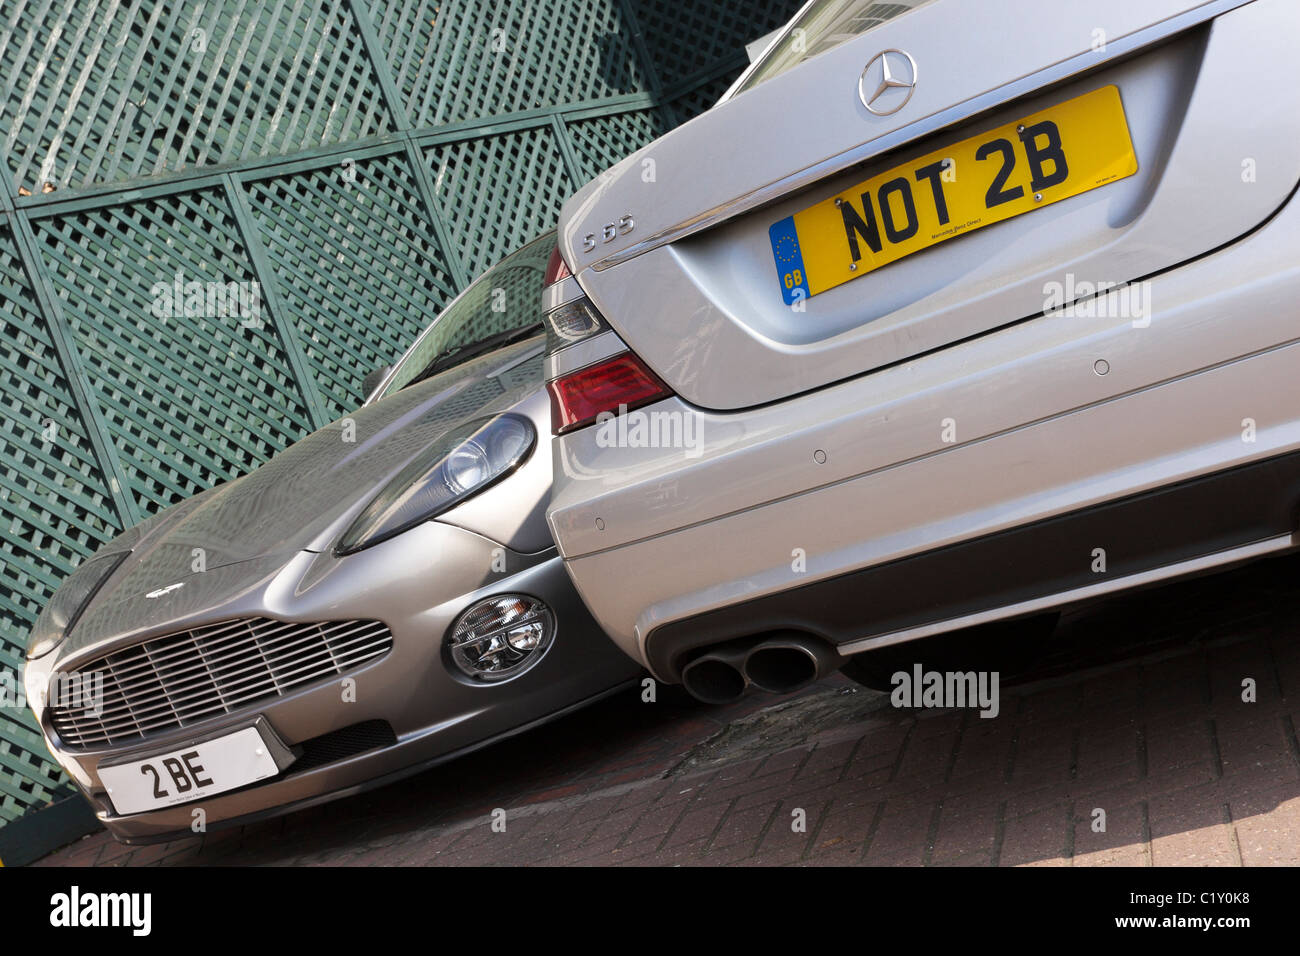 Mercedes Benz Number Plates Stockfotos & Mercedes Benz Number Plates ...